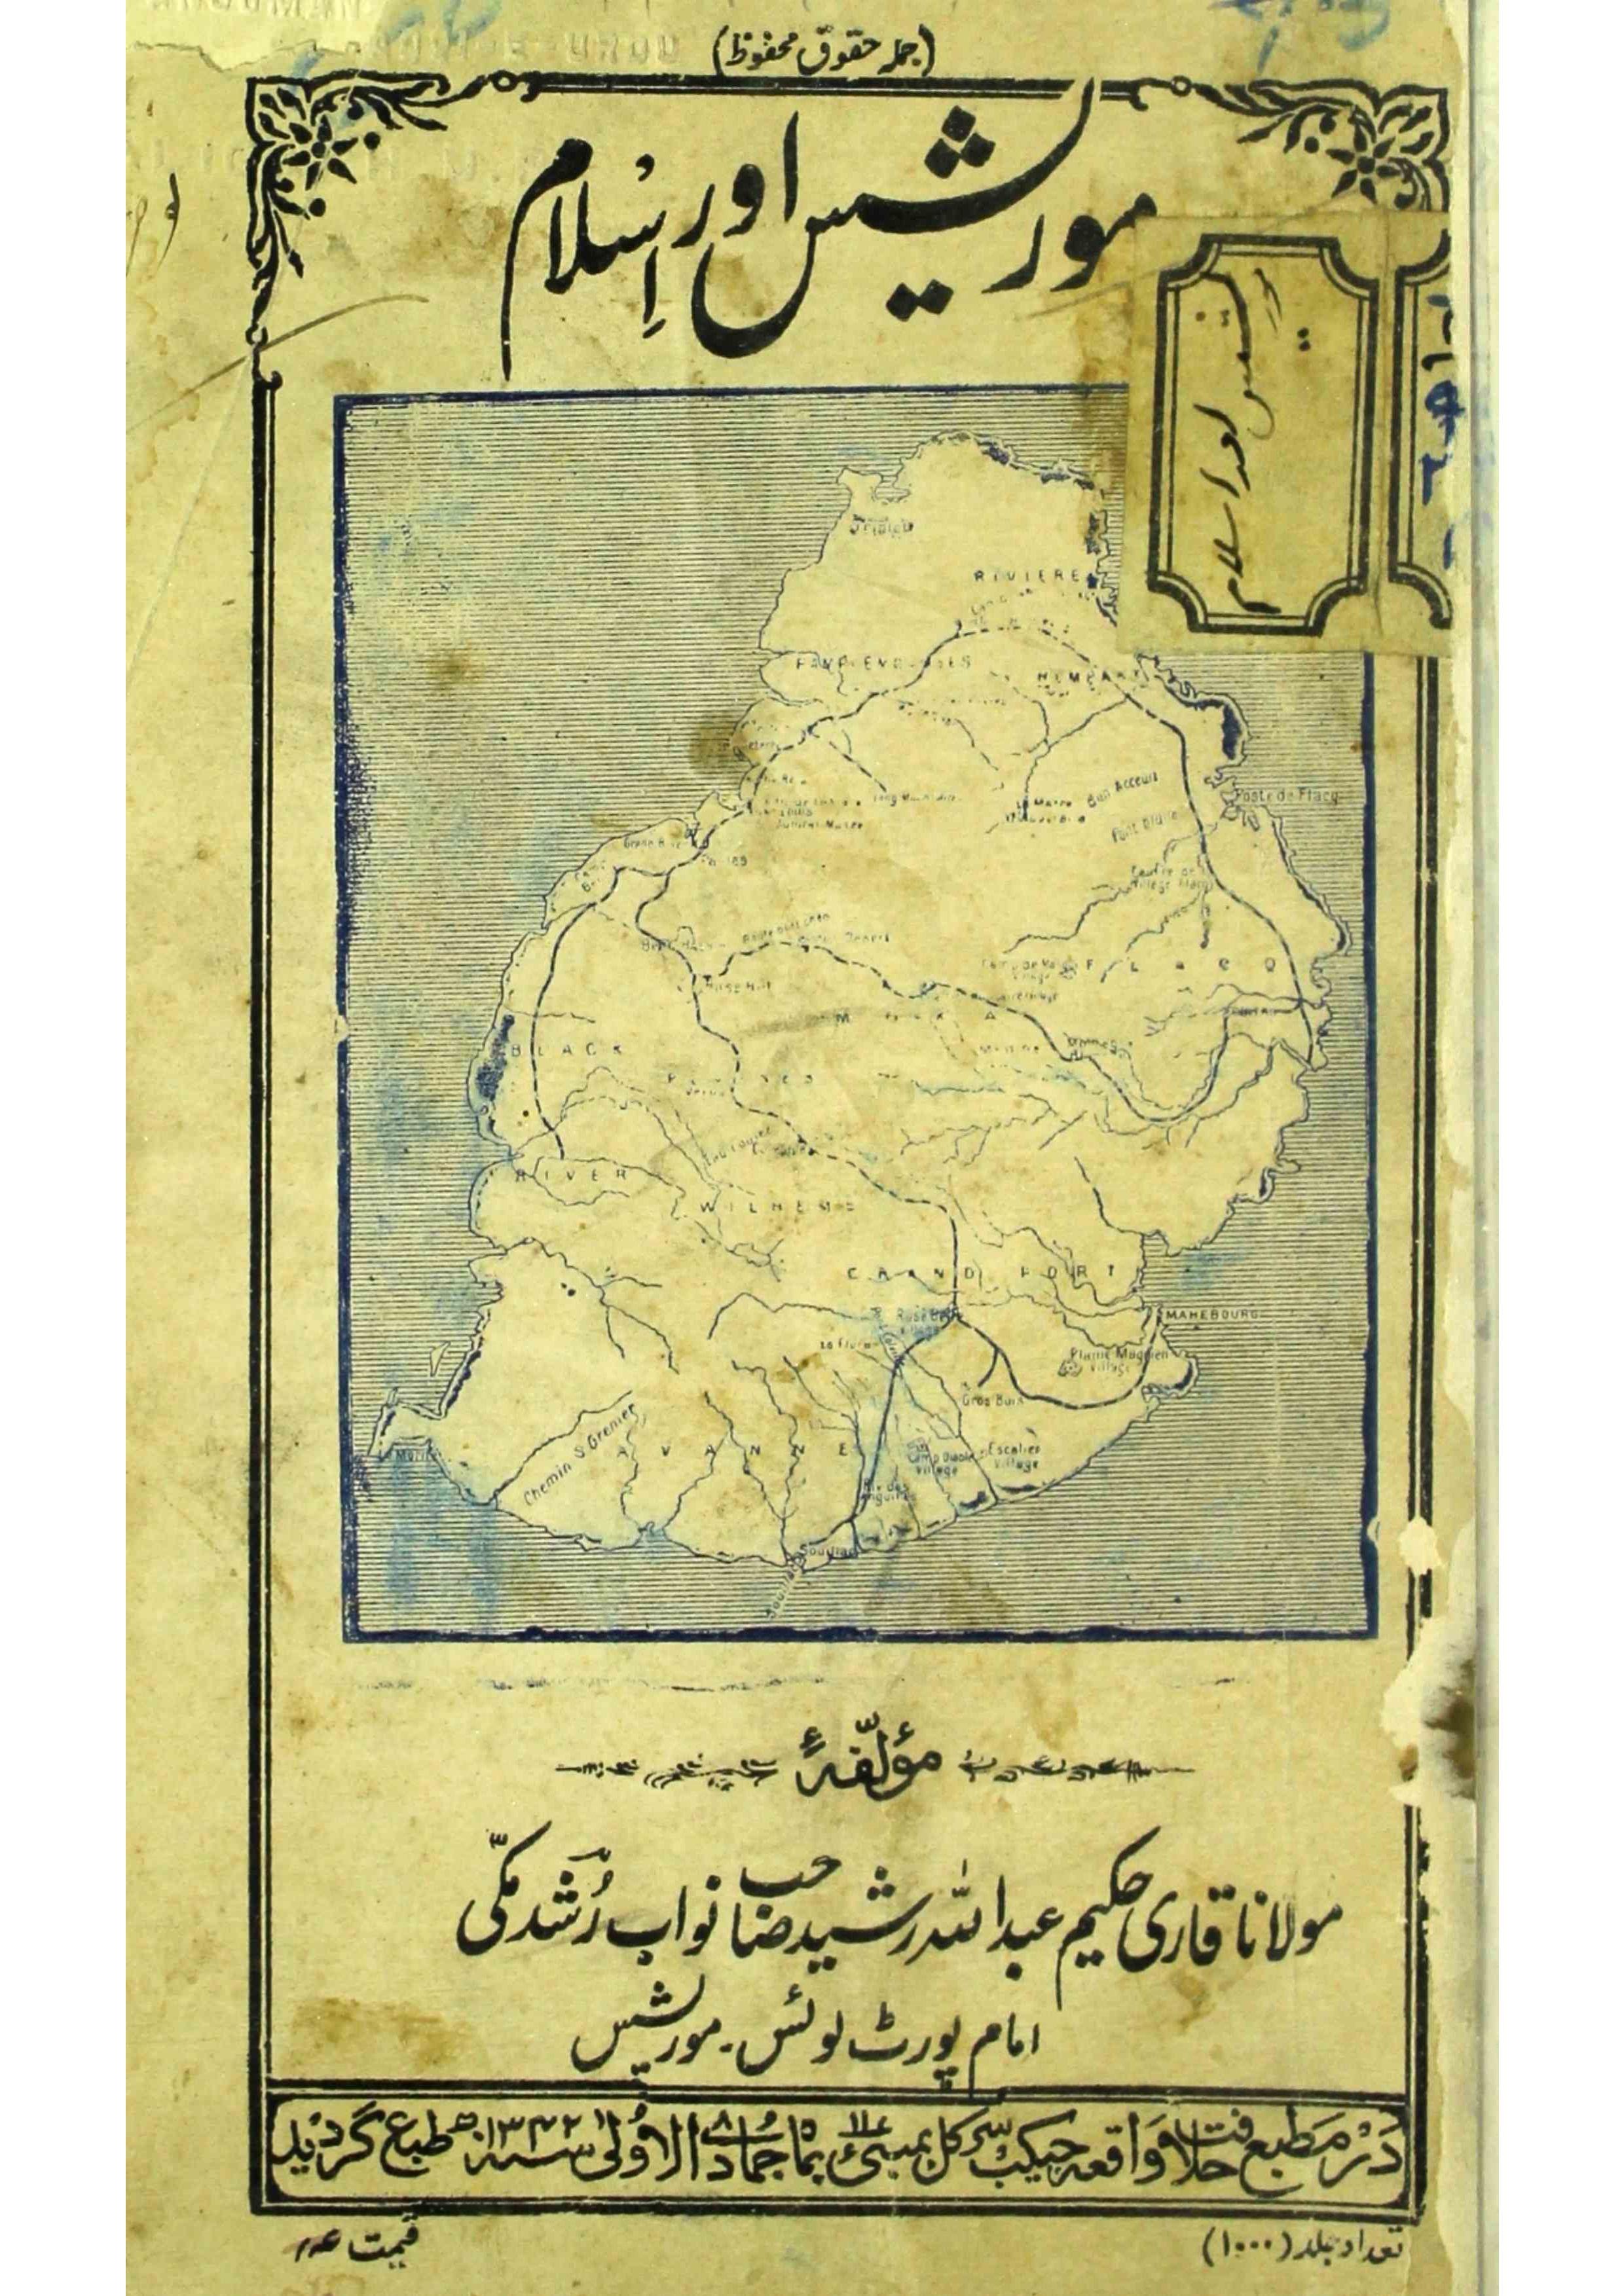 Maurices Aur Islam